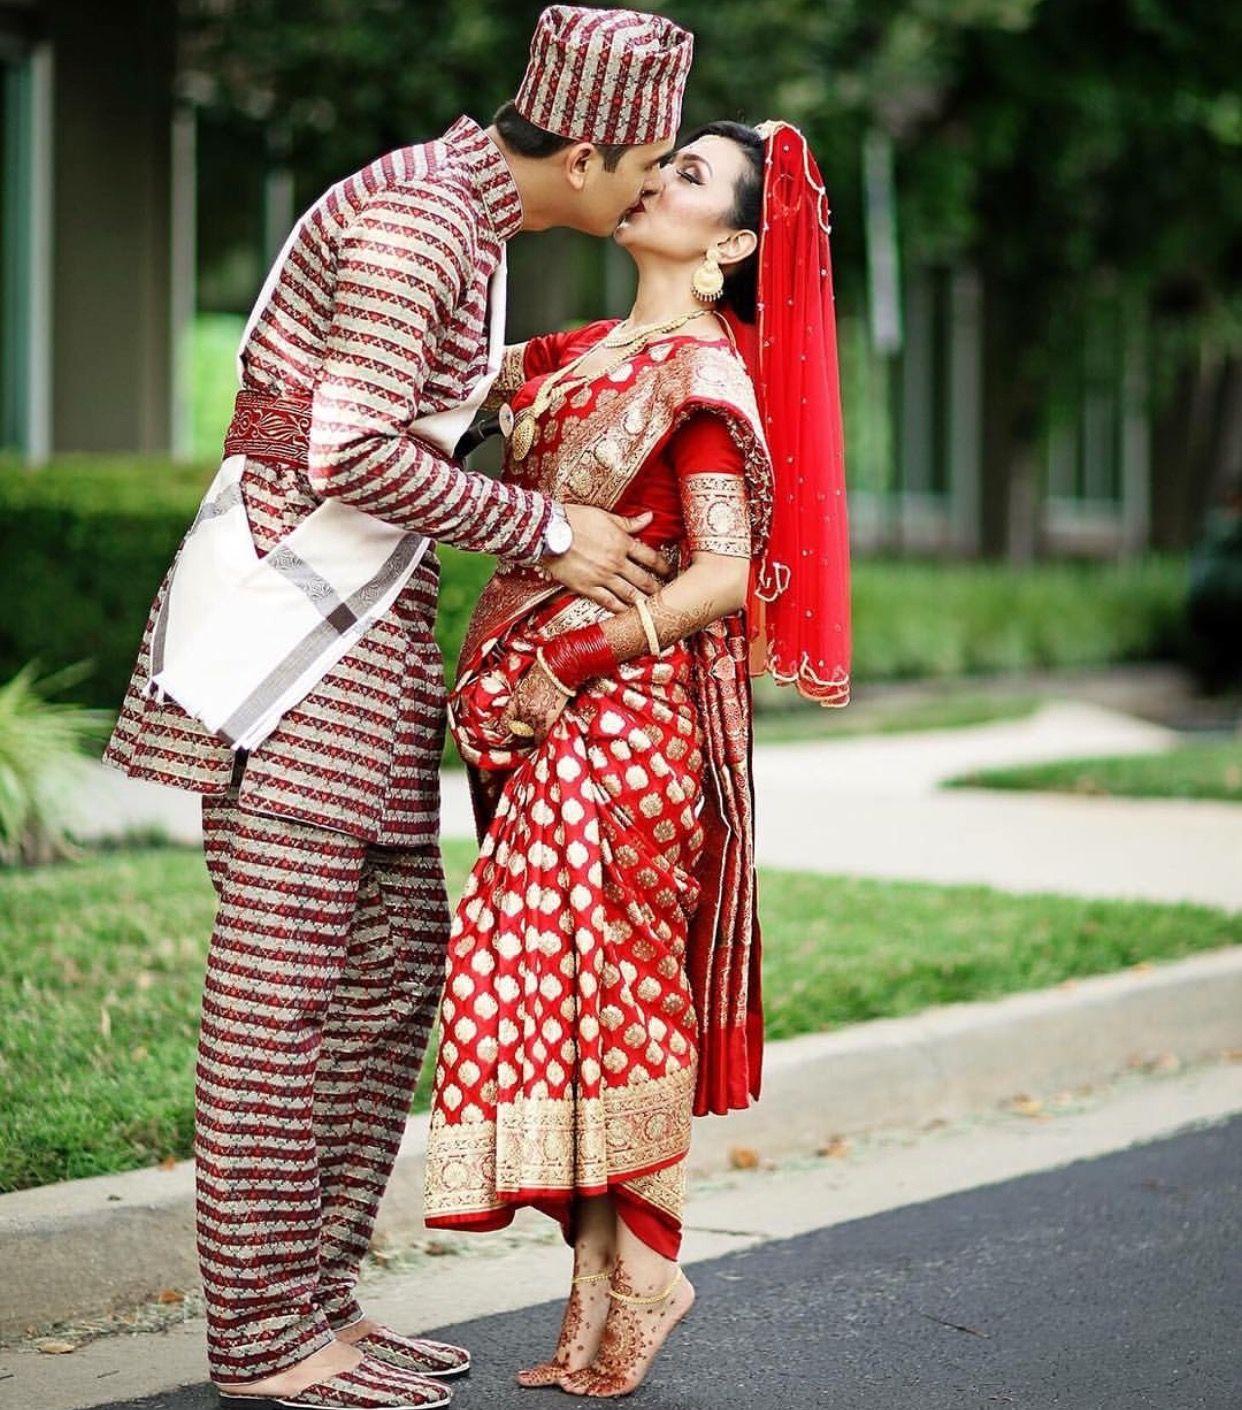 Pin by rakshya sharma on traditional wedding pinterest wedding